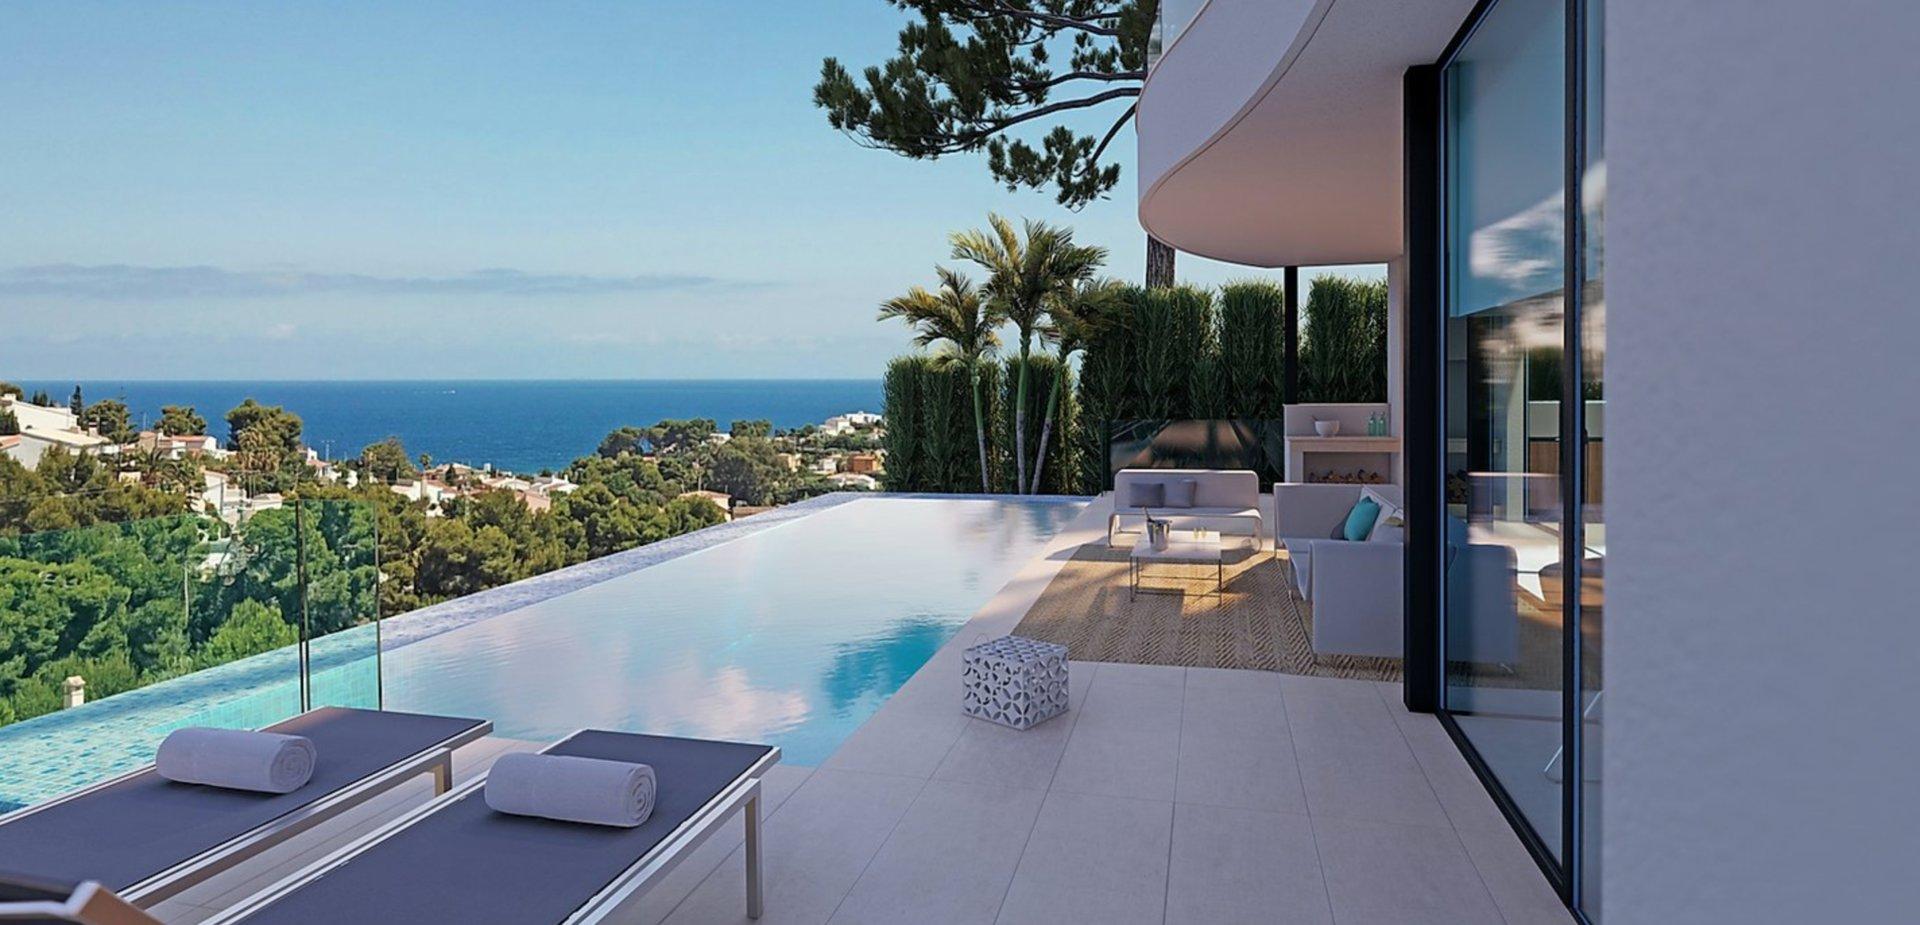 Villa neuve avec 4 chambres et vue mer